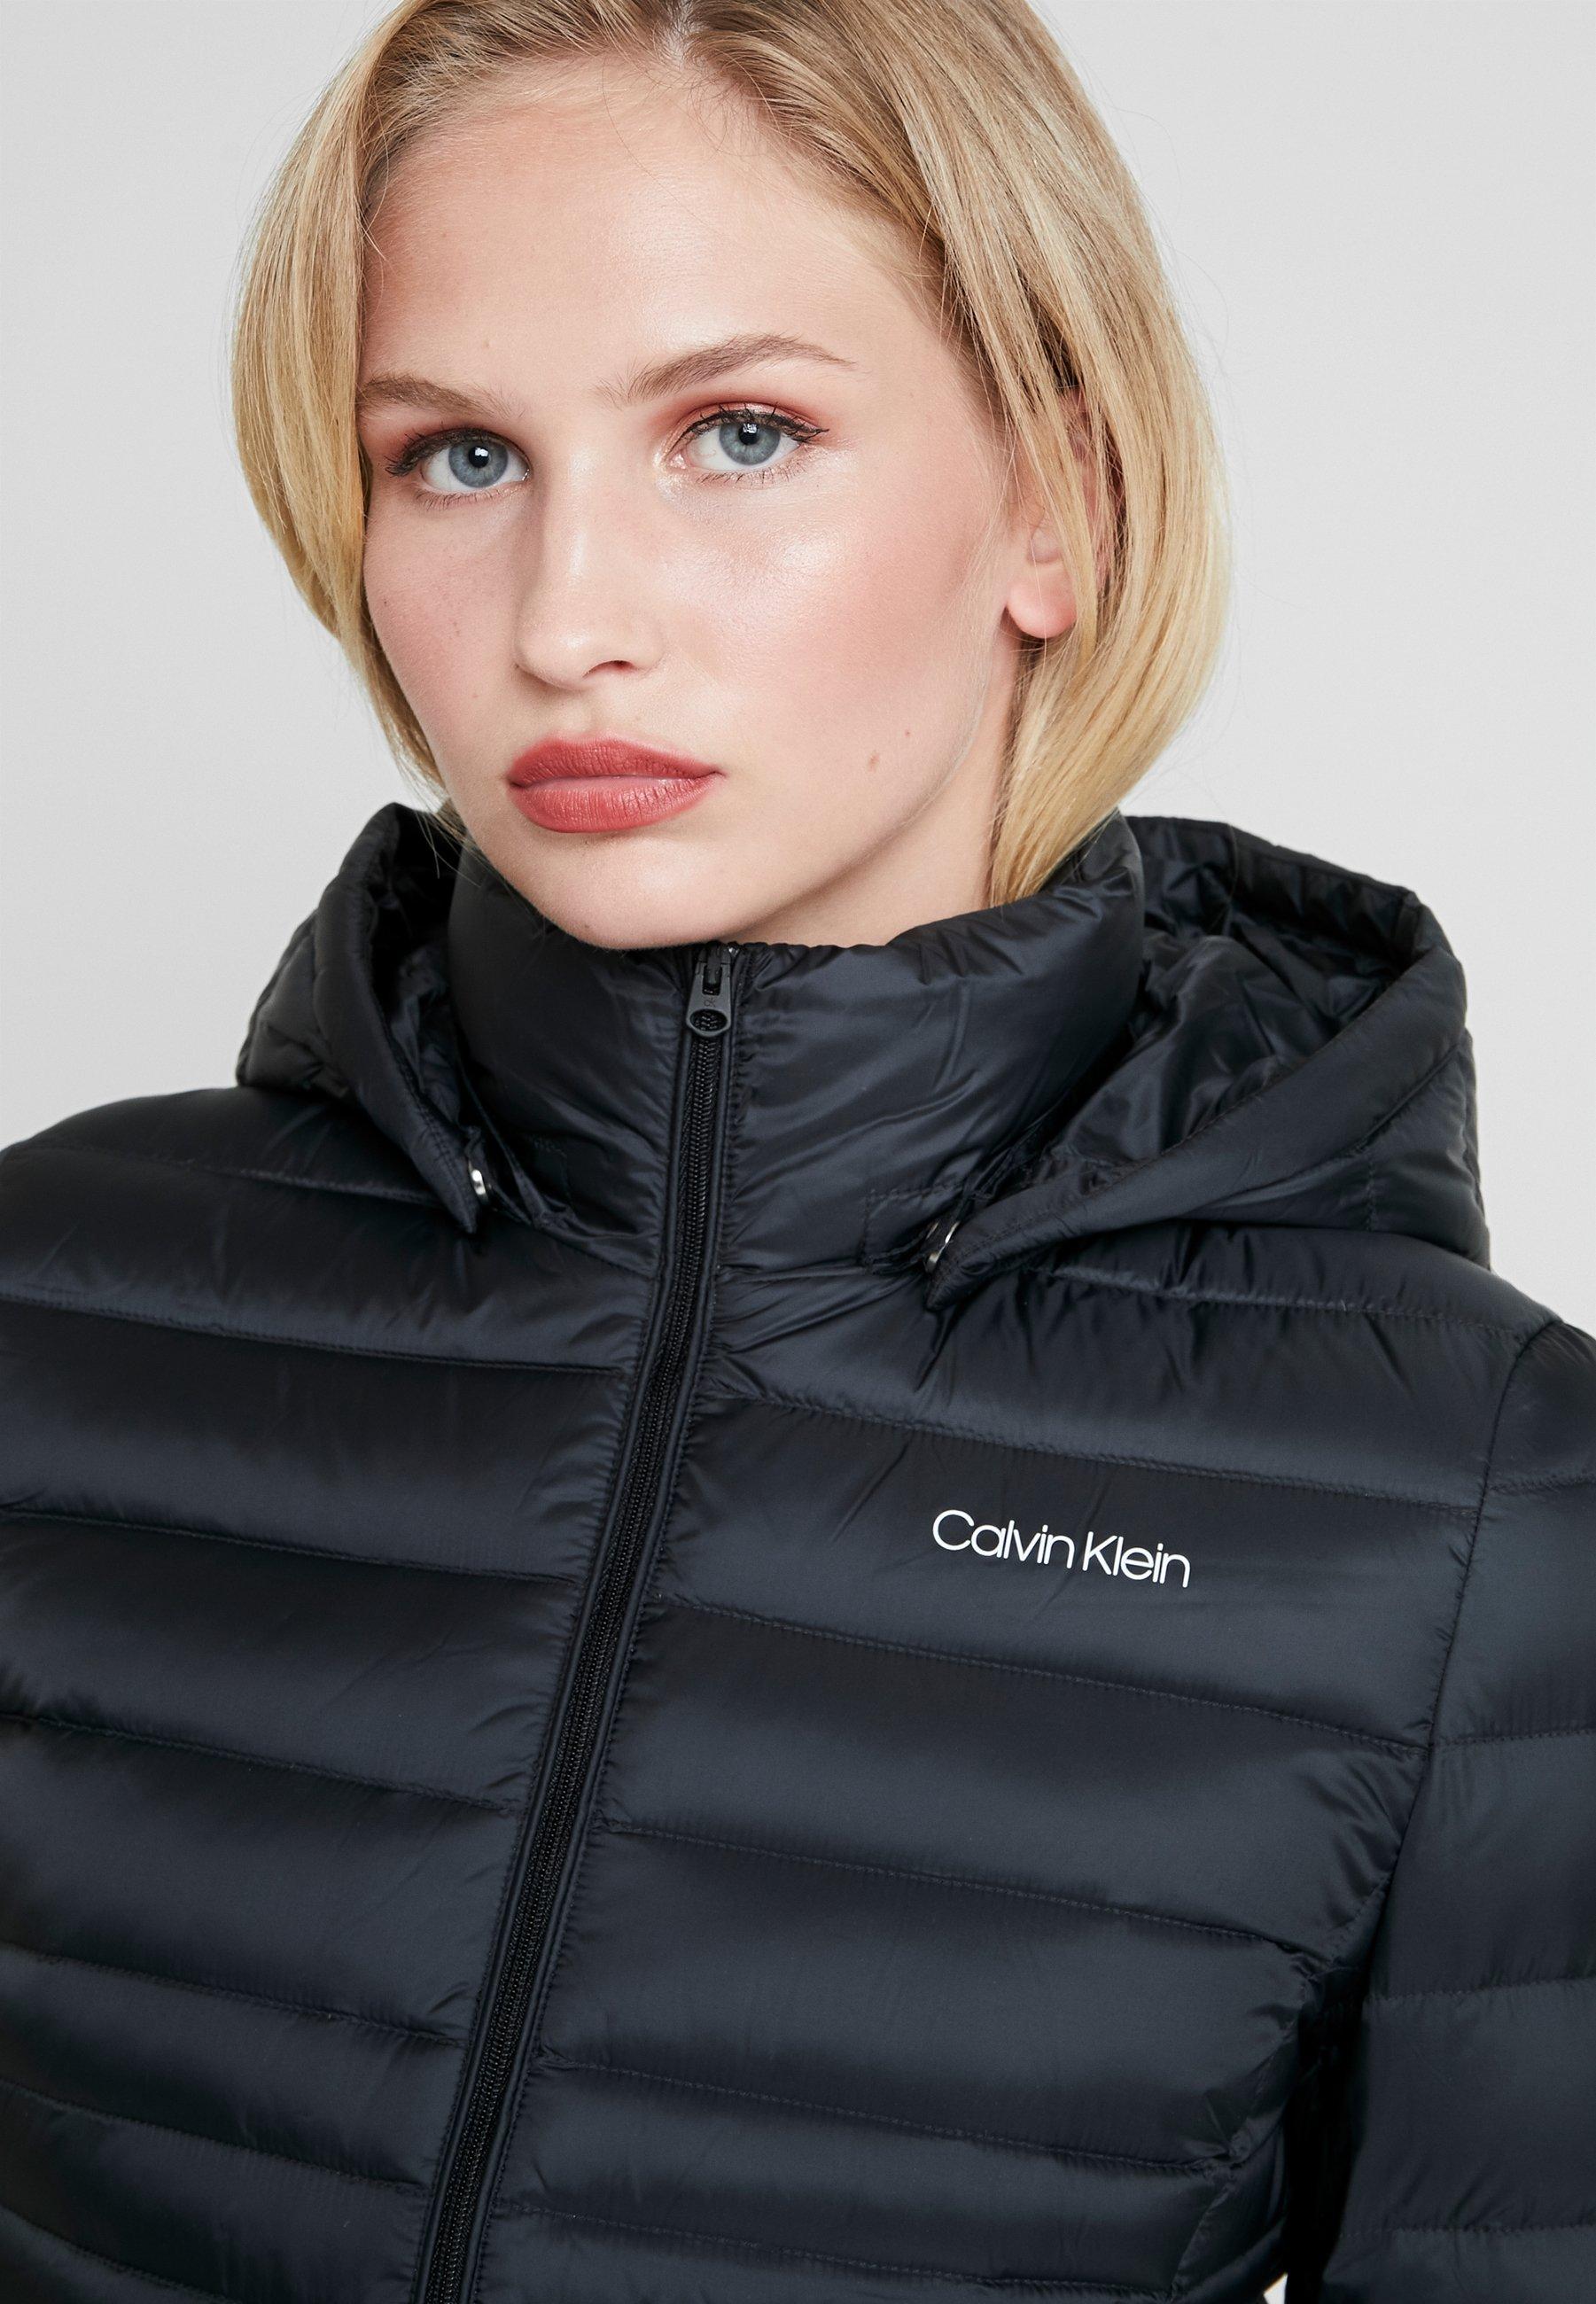 Klein JacketDoudoune Black Down Light Essential Calvin w0OPnk